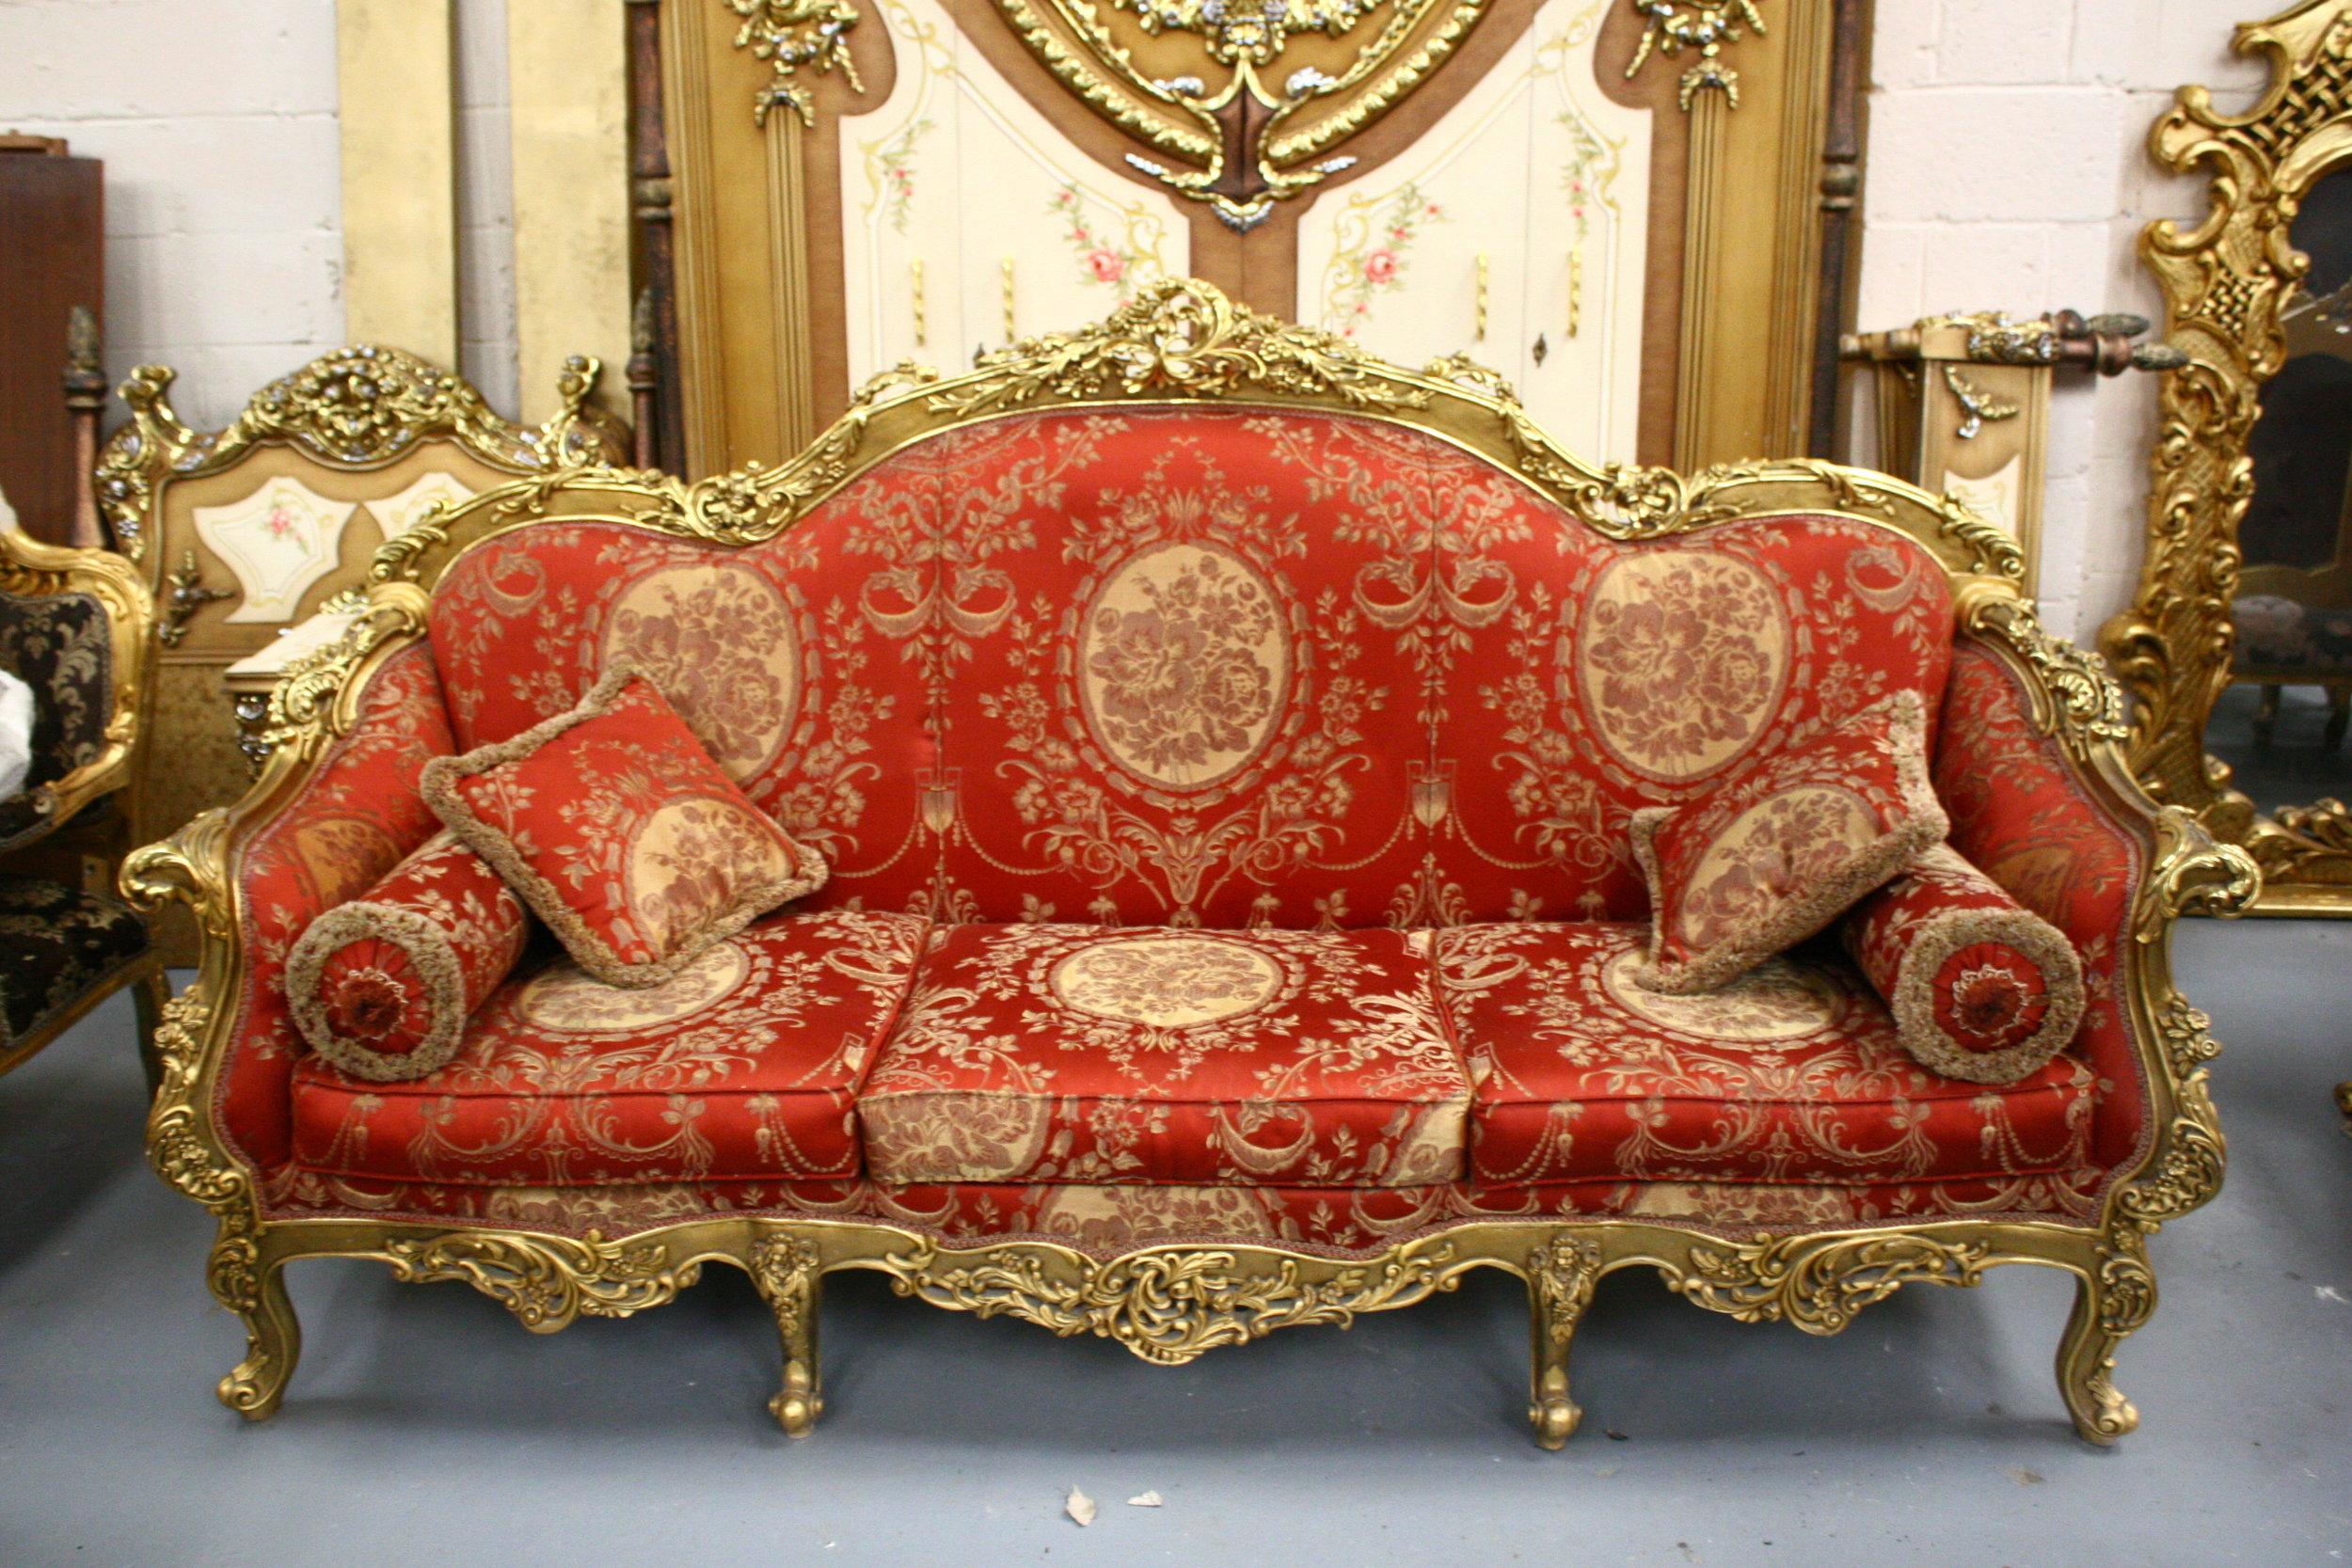 Gilt sofa salon chairs french Renaissance Antique Warehouse Dublin ireland